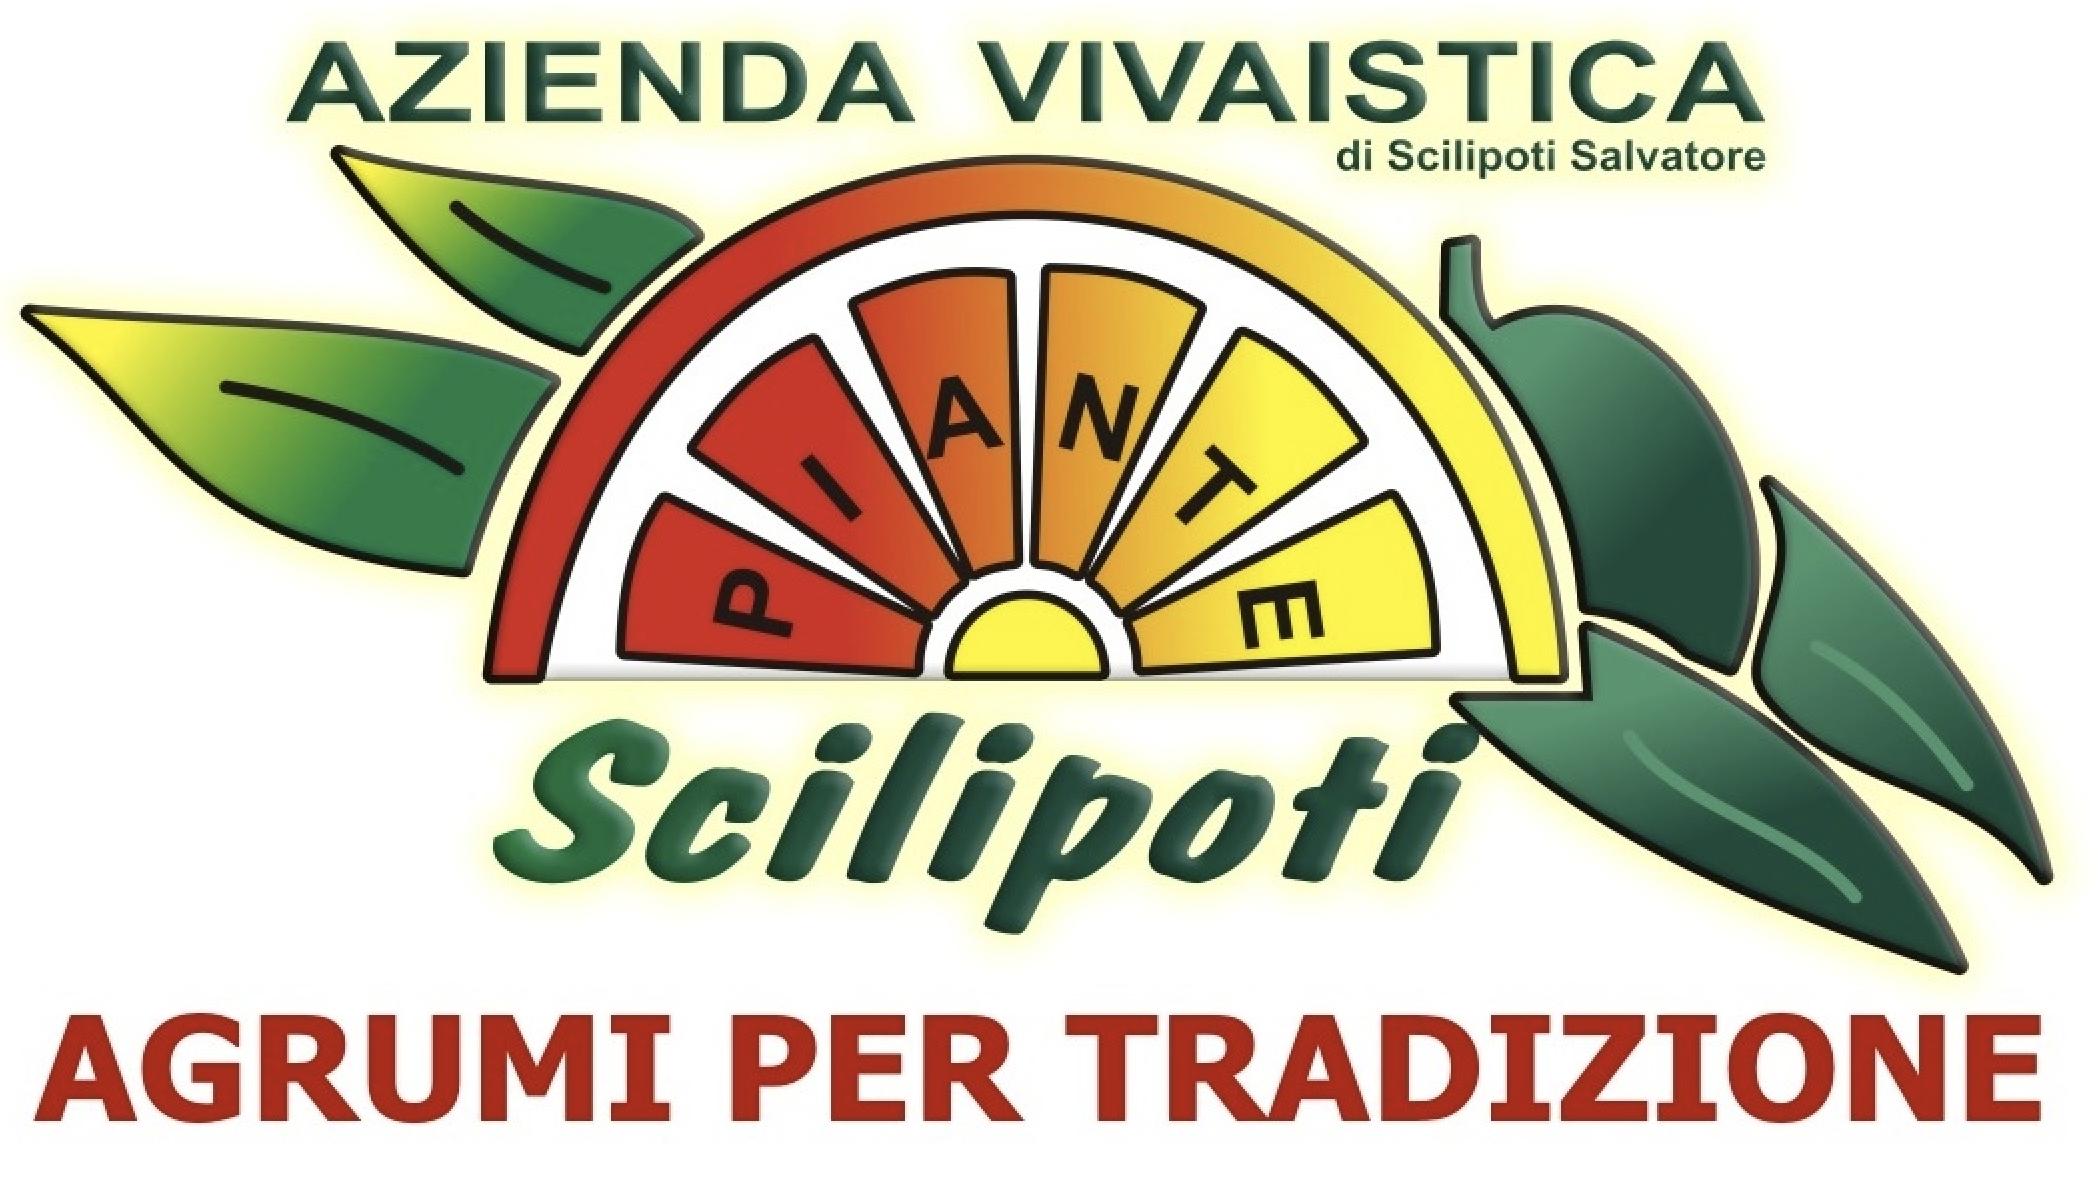 piantescilipoti.com